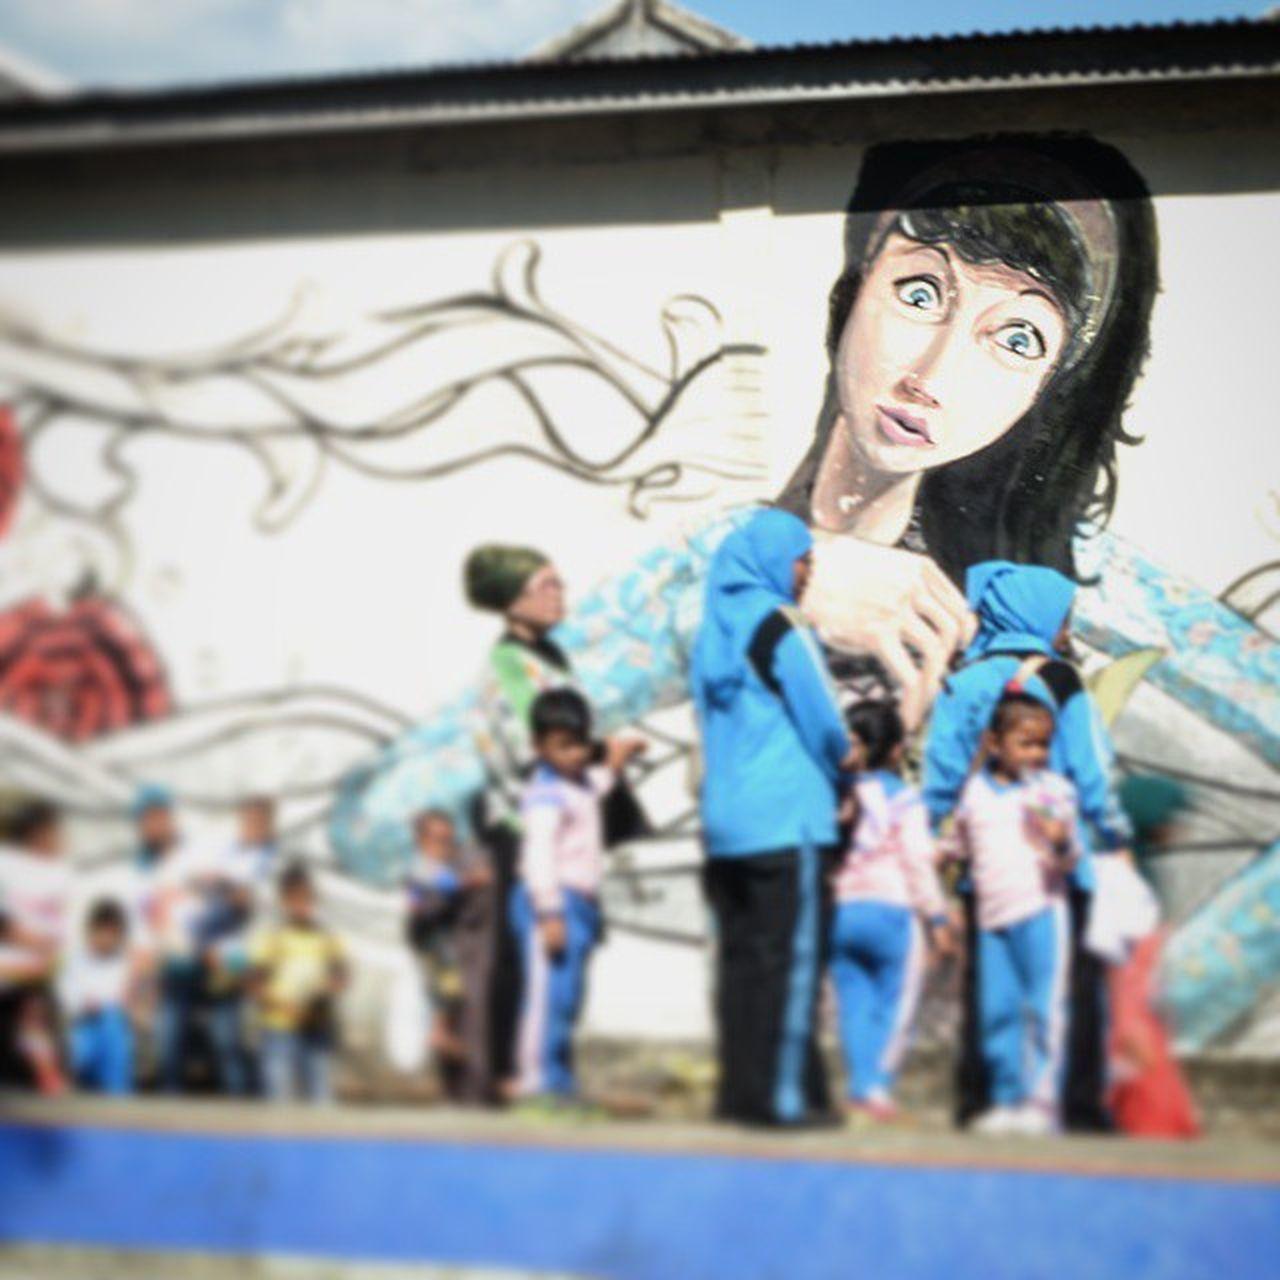 Lukisan dinding kota.. Belajarmotret Gravity Humaninterest Hipaae Hipasnap Traveling Home For The Holidays